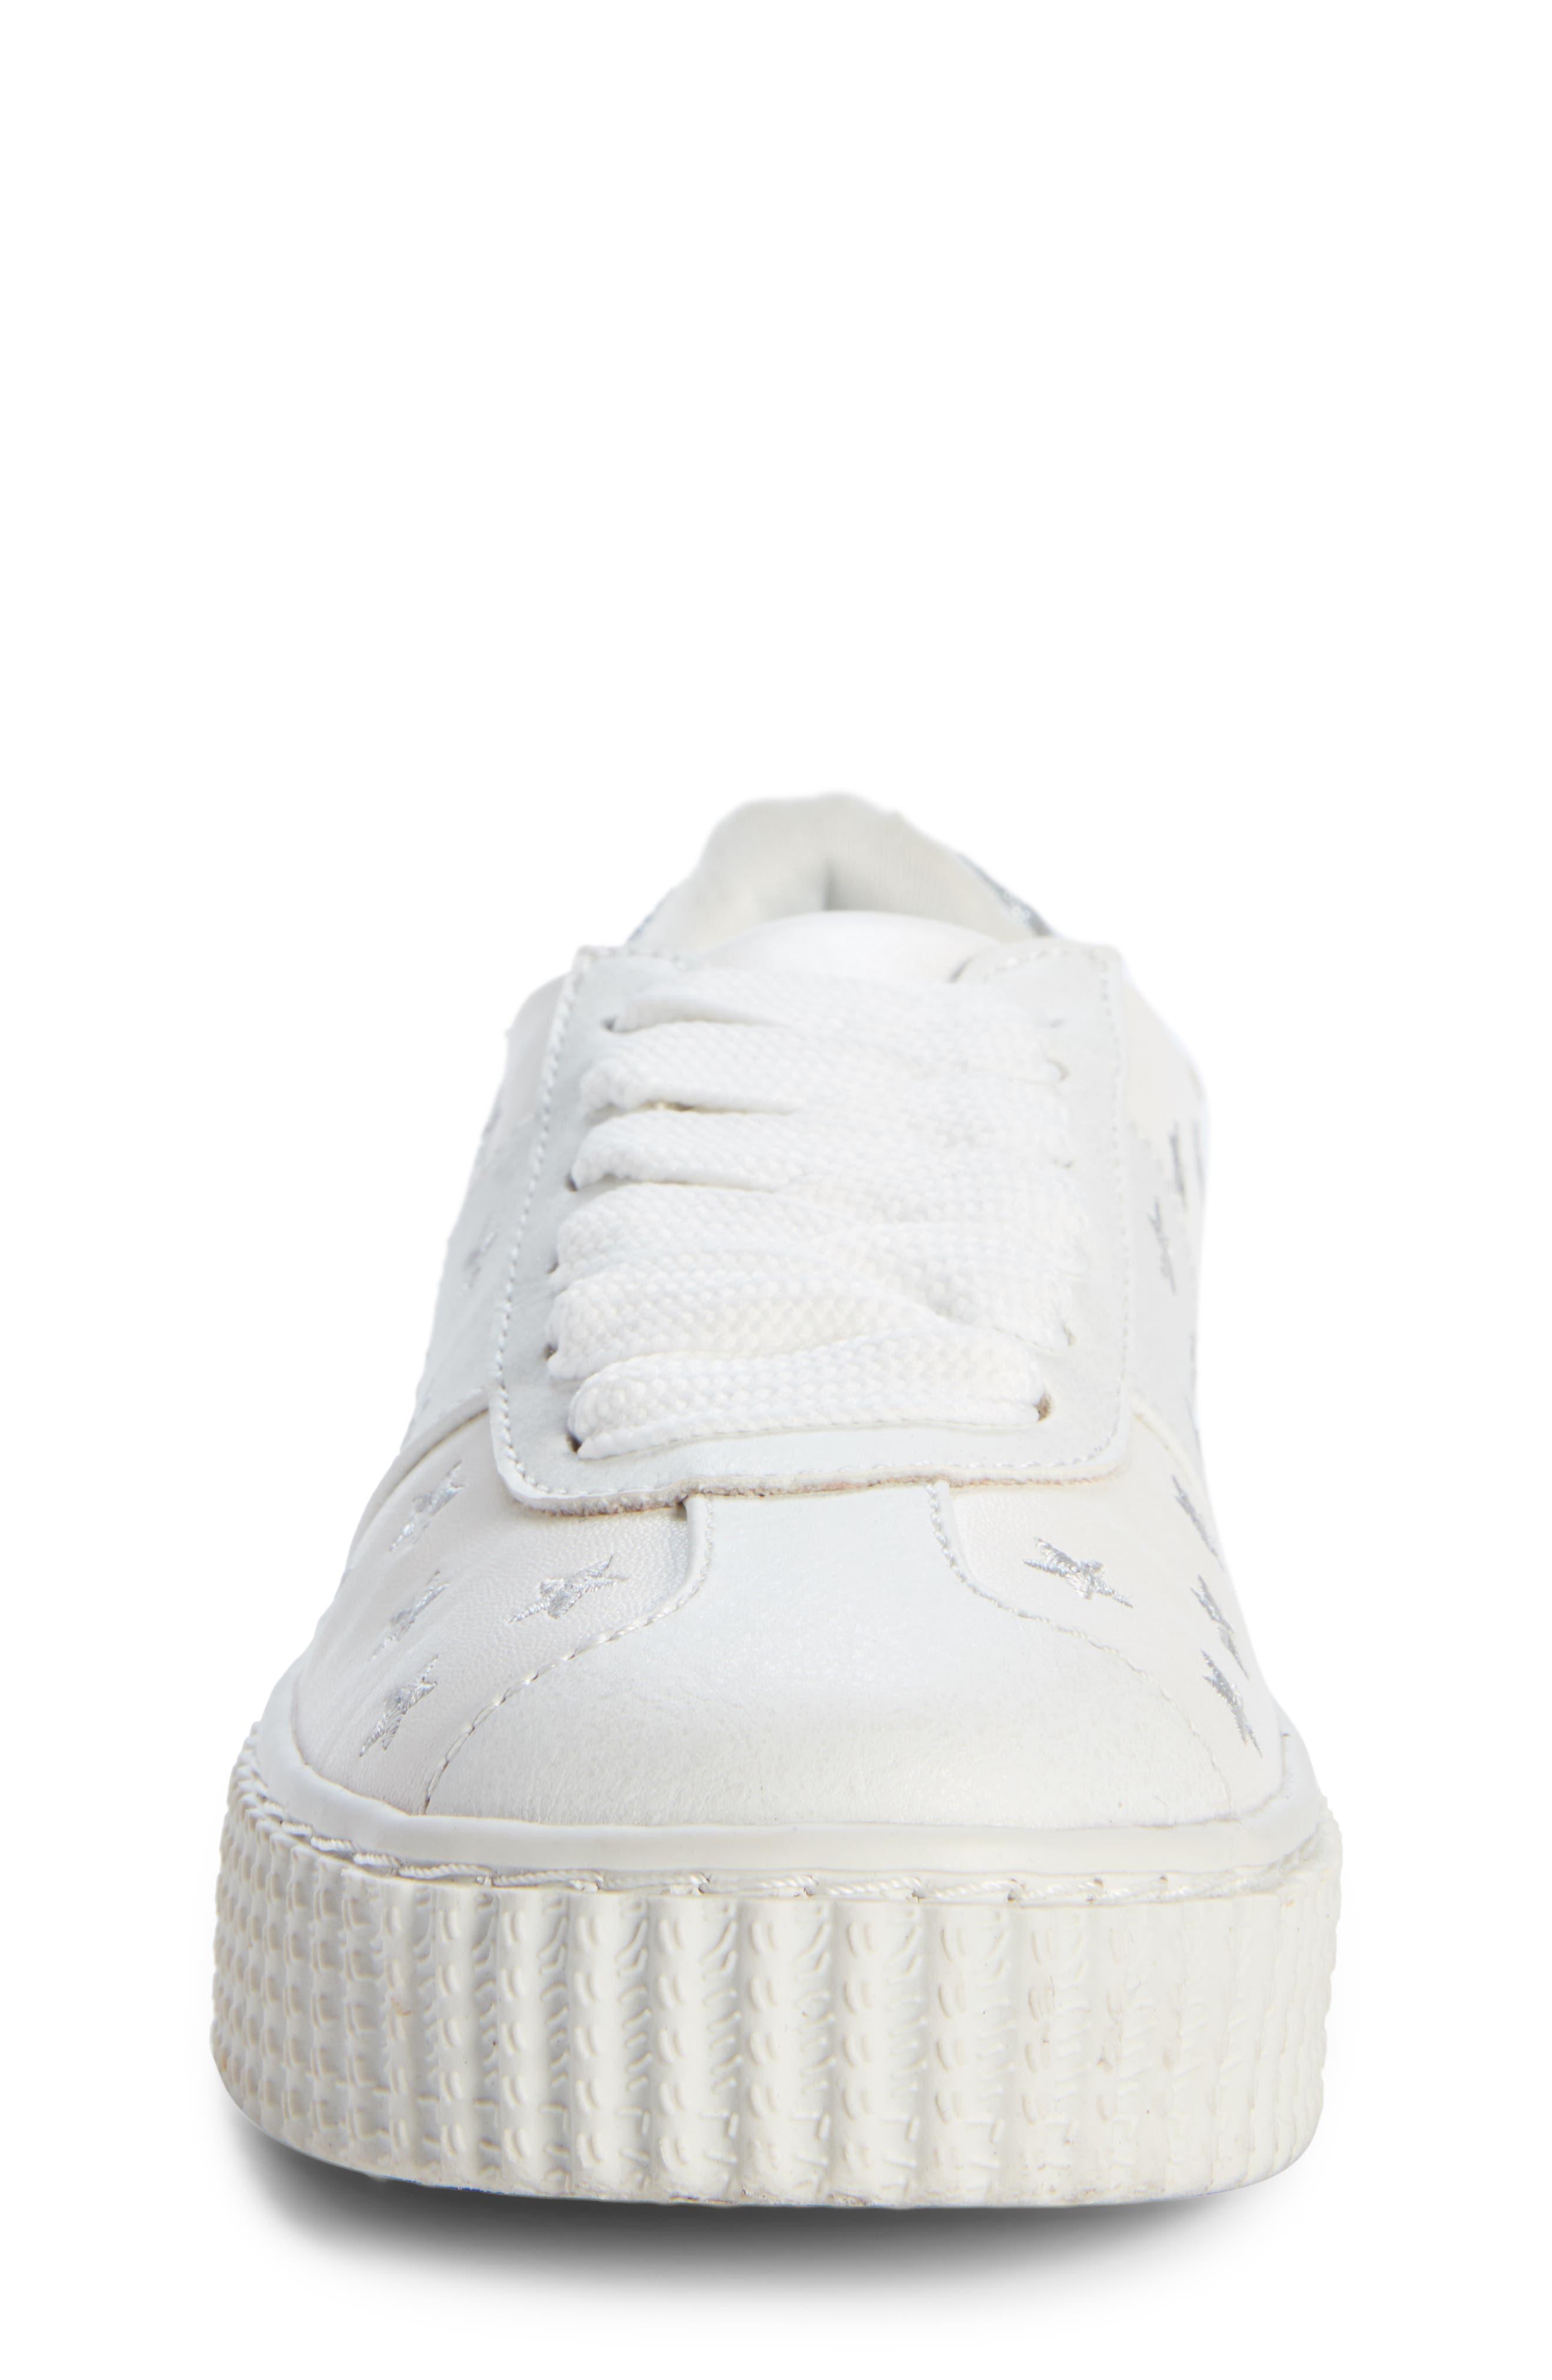 Cadin Star Creeper Sneaker,                             Alternate thumbnail 4, color,                             100